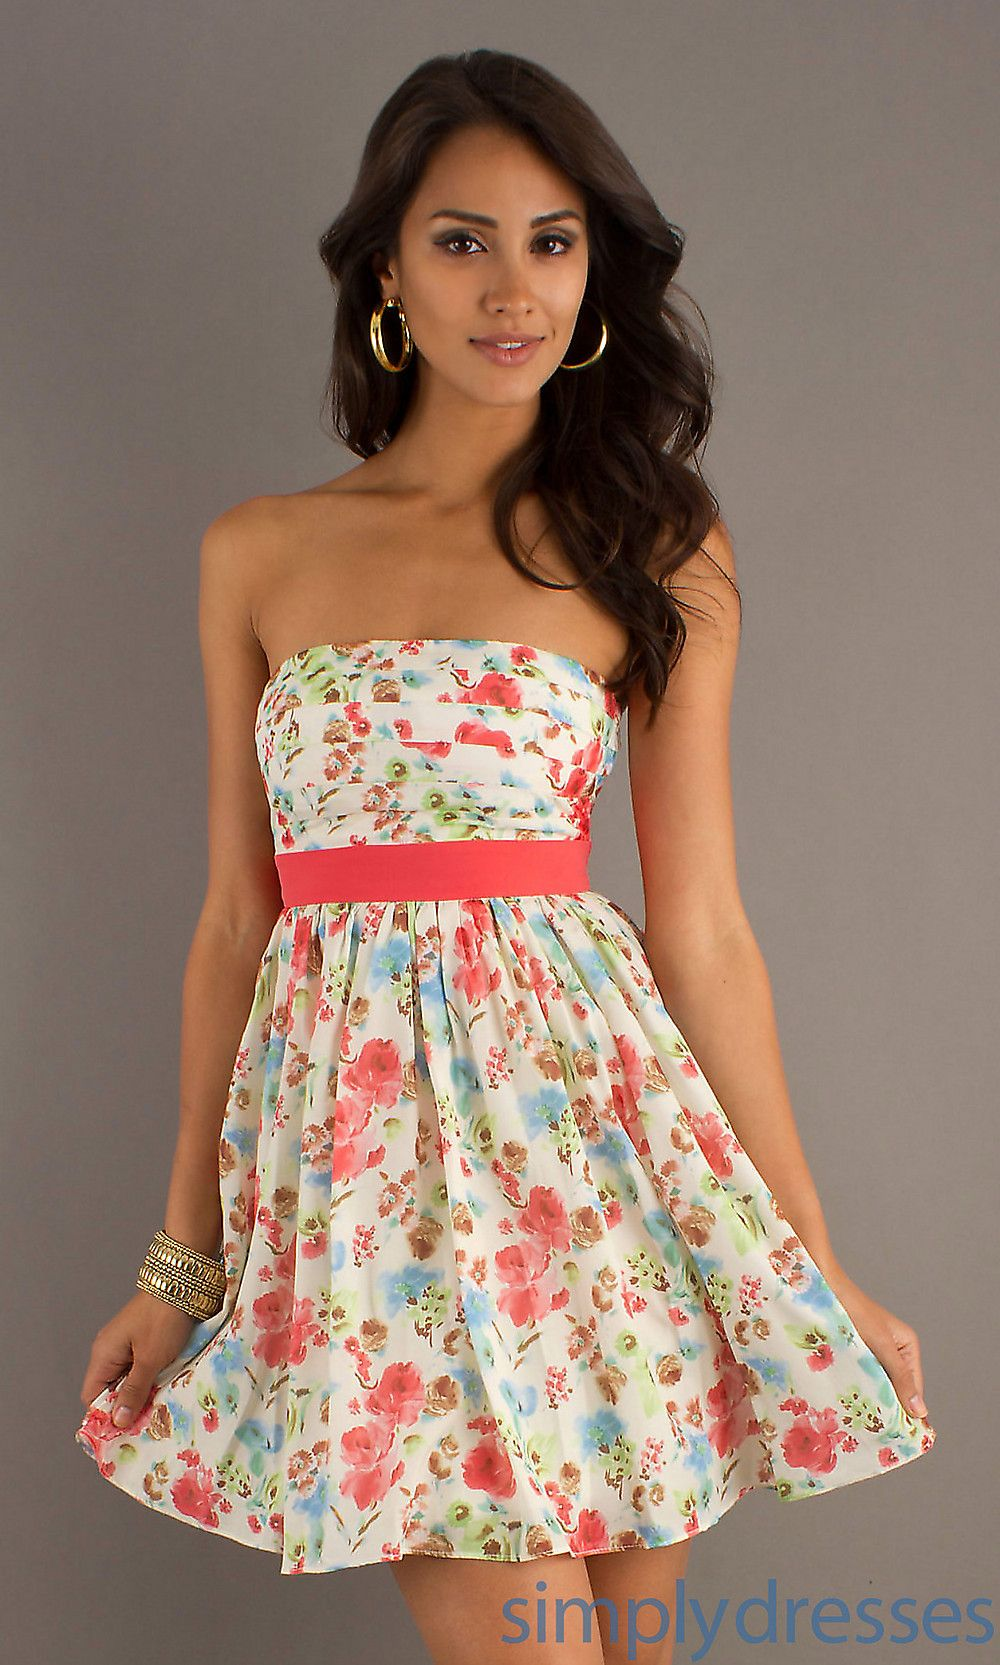 Short Strapless Print Dress Dresses Prom Dresses Printed Short Dresses [ 1665 x 1000 Pixel ]